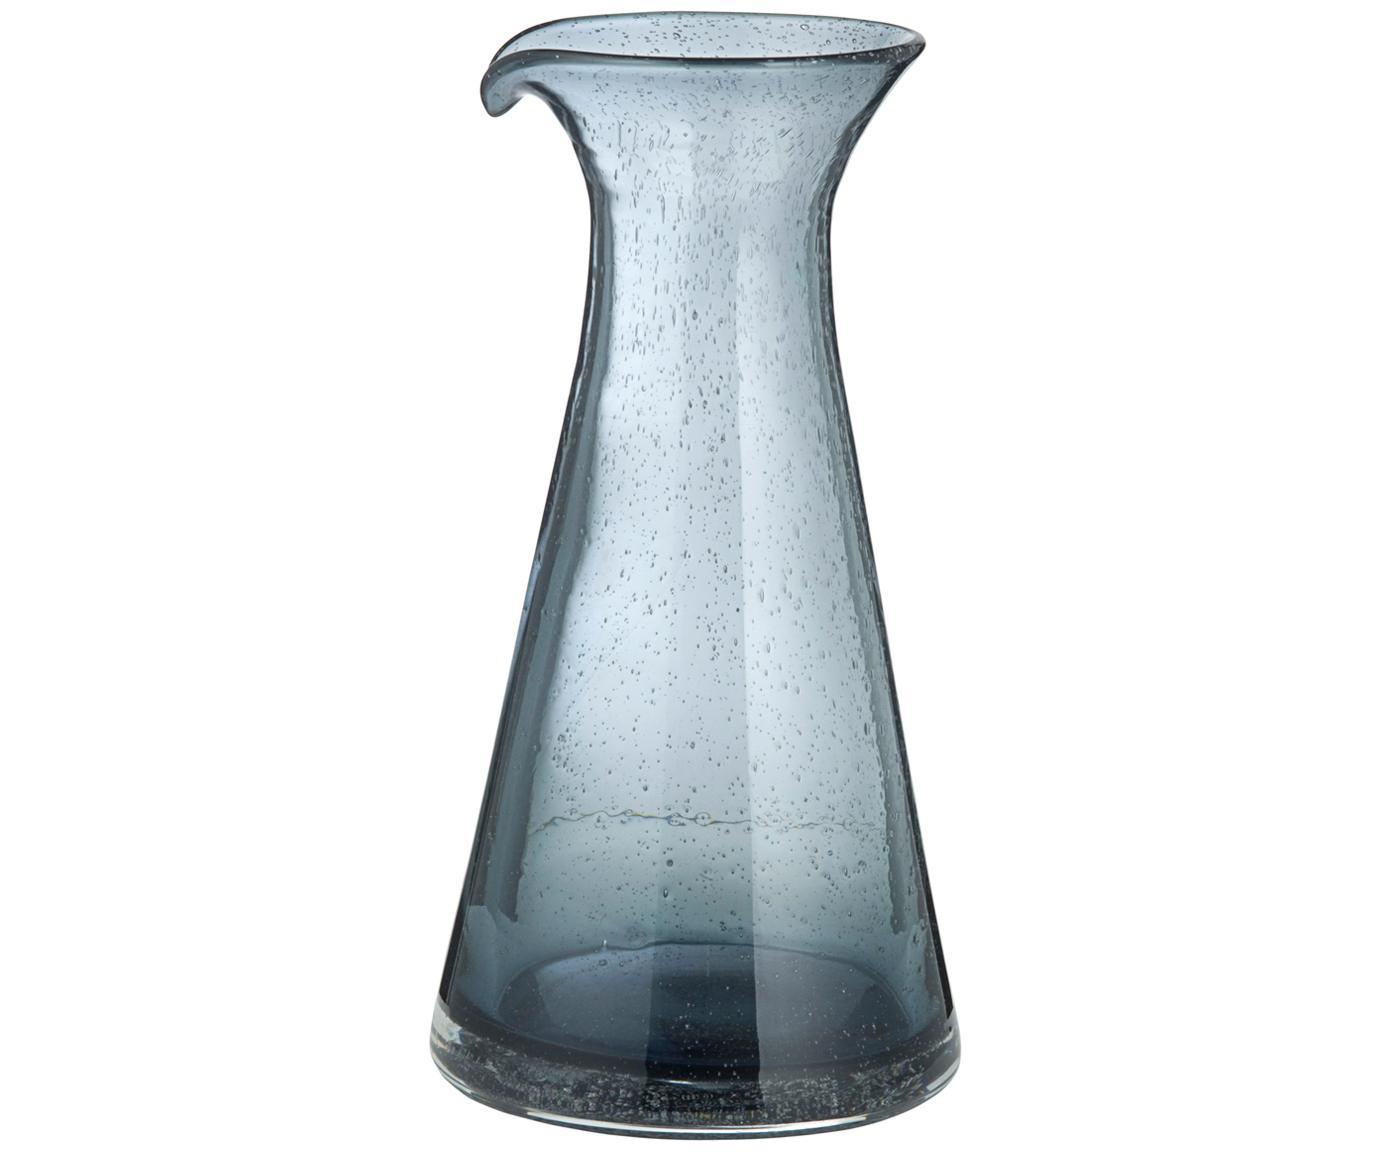 Jarra de vidrio soplado Bubble, Vidrio, Gris transparente, 800 ml